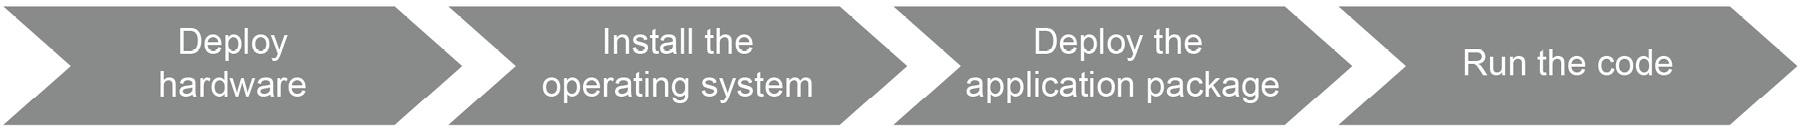 Figure 1.1: Traditional software development